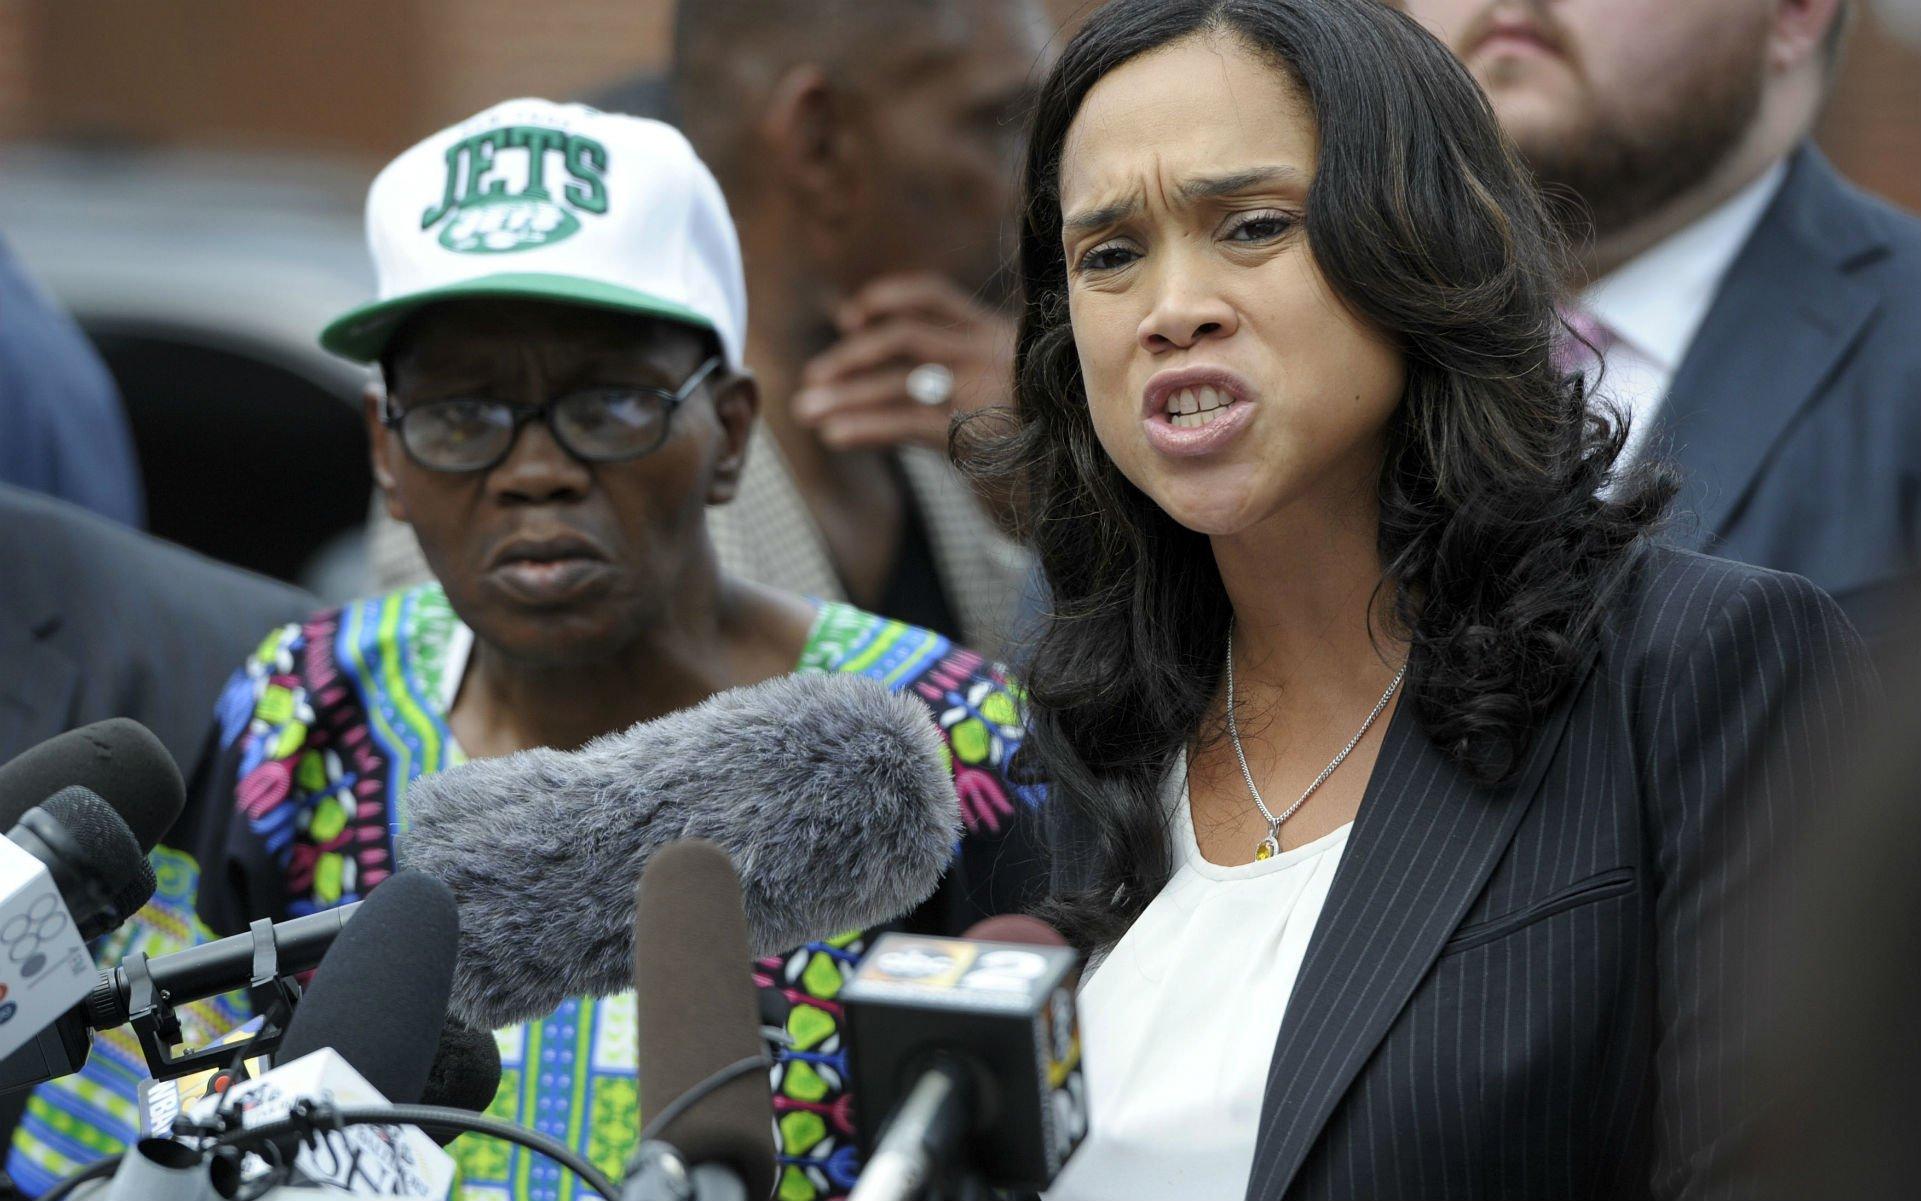 Baltimore Prosecutor Files Rare Petition to Erase Cannabis Convictions